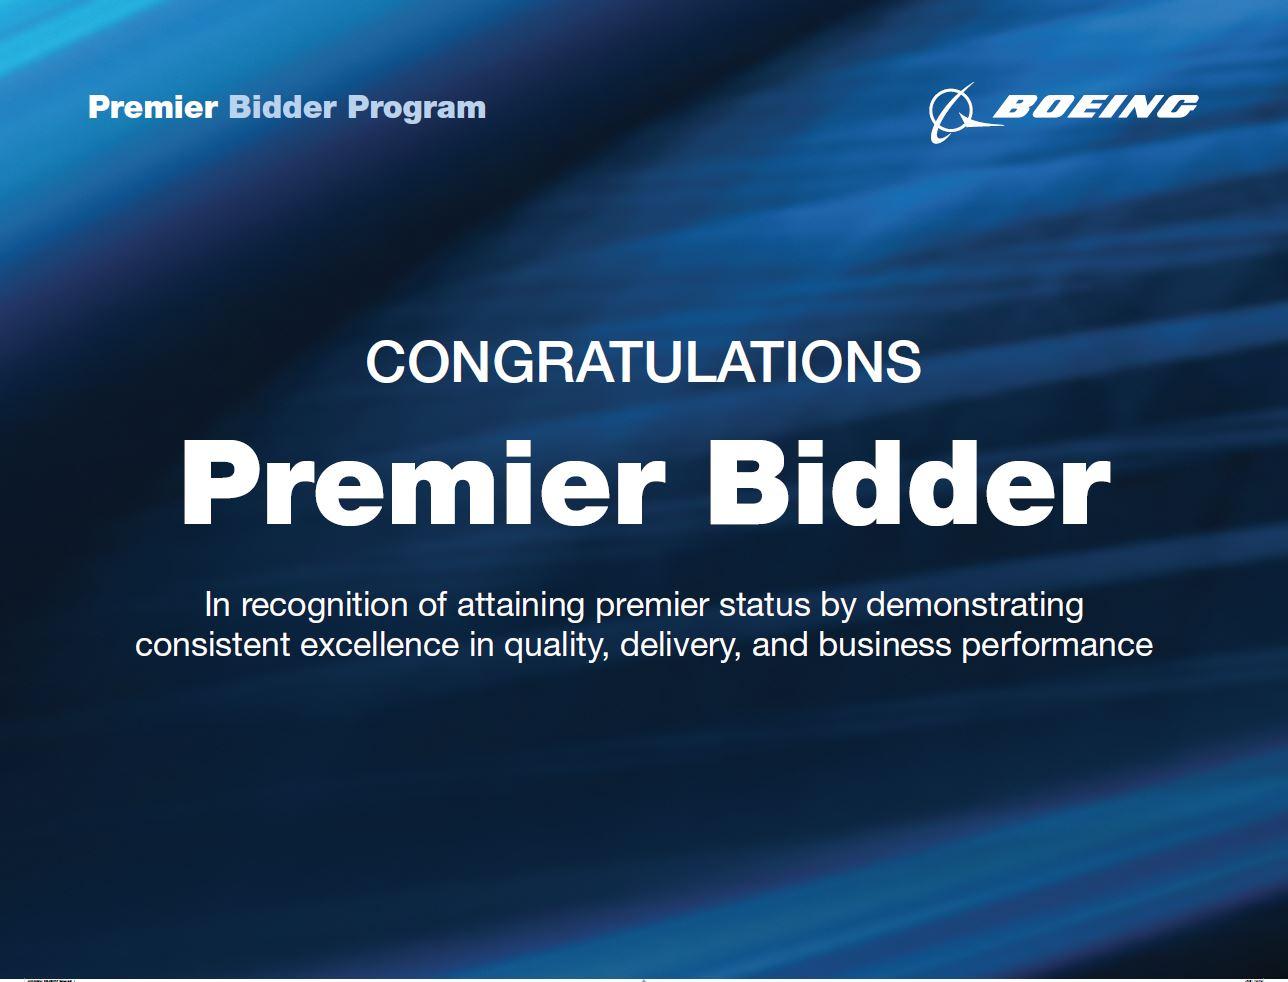 Premier Bidder Program Banner